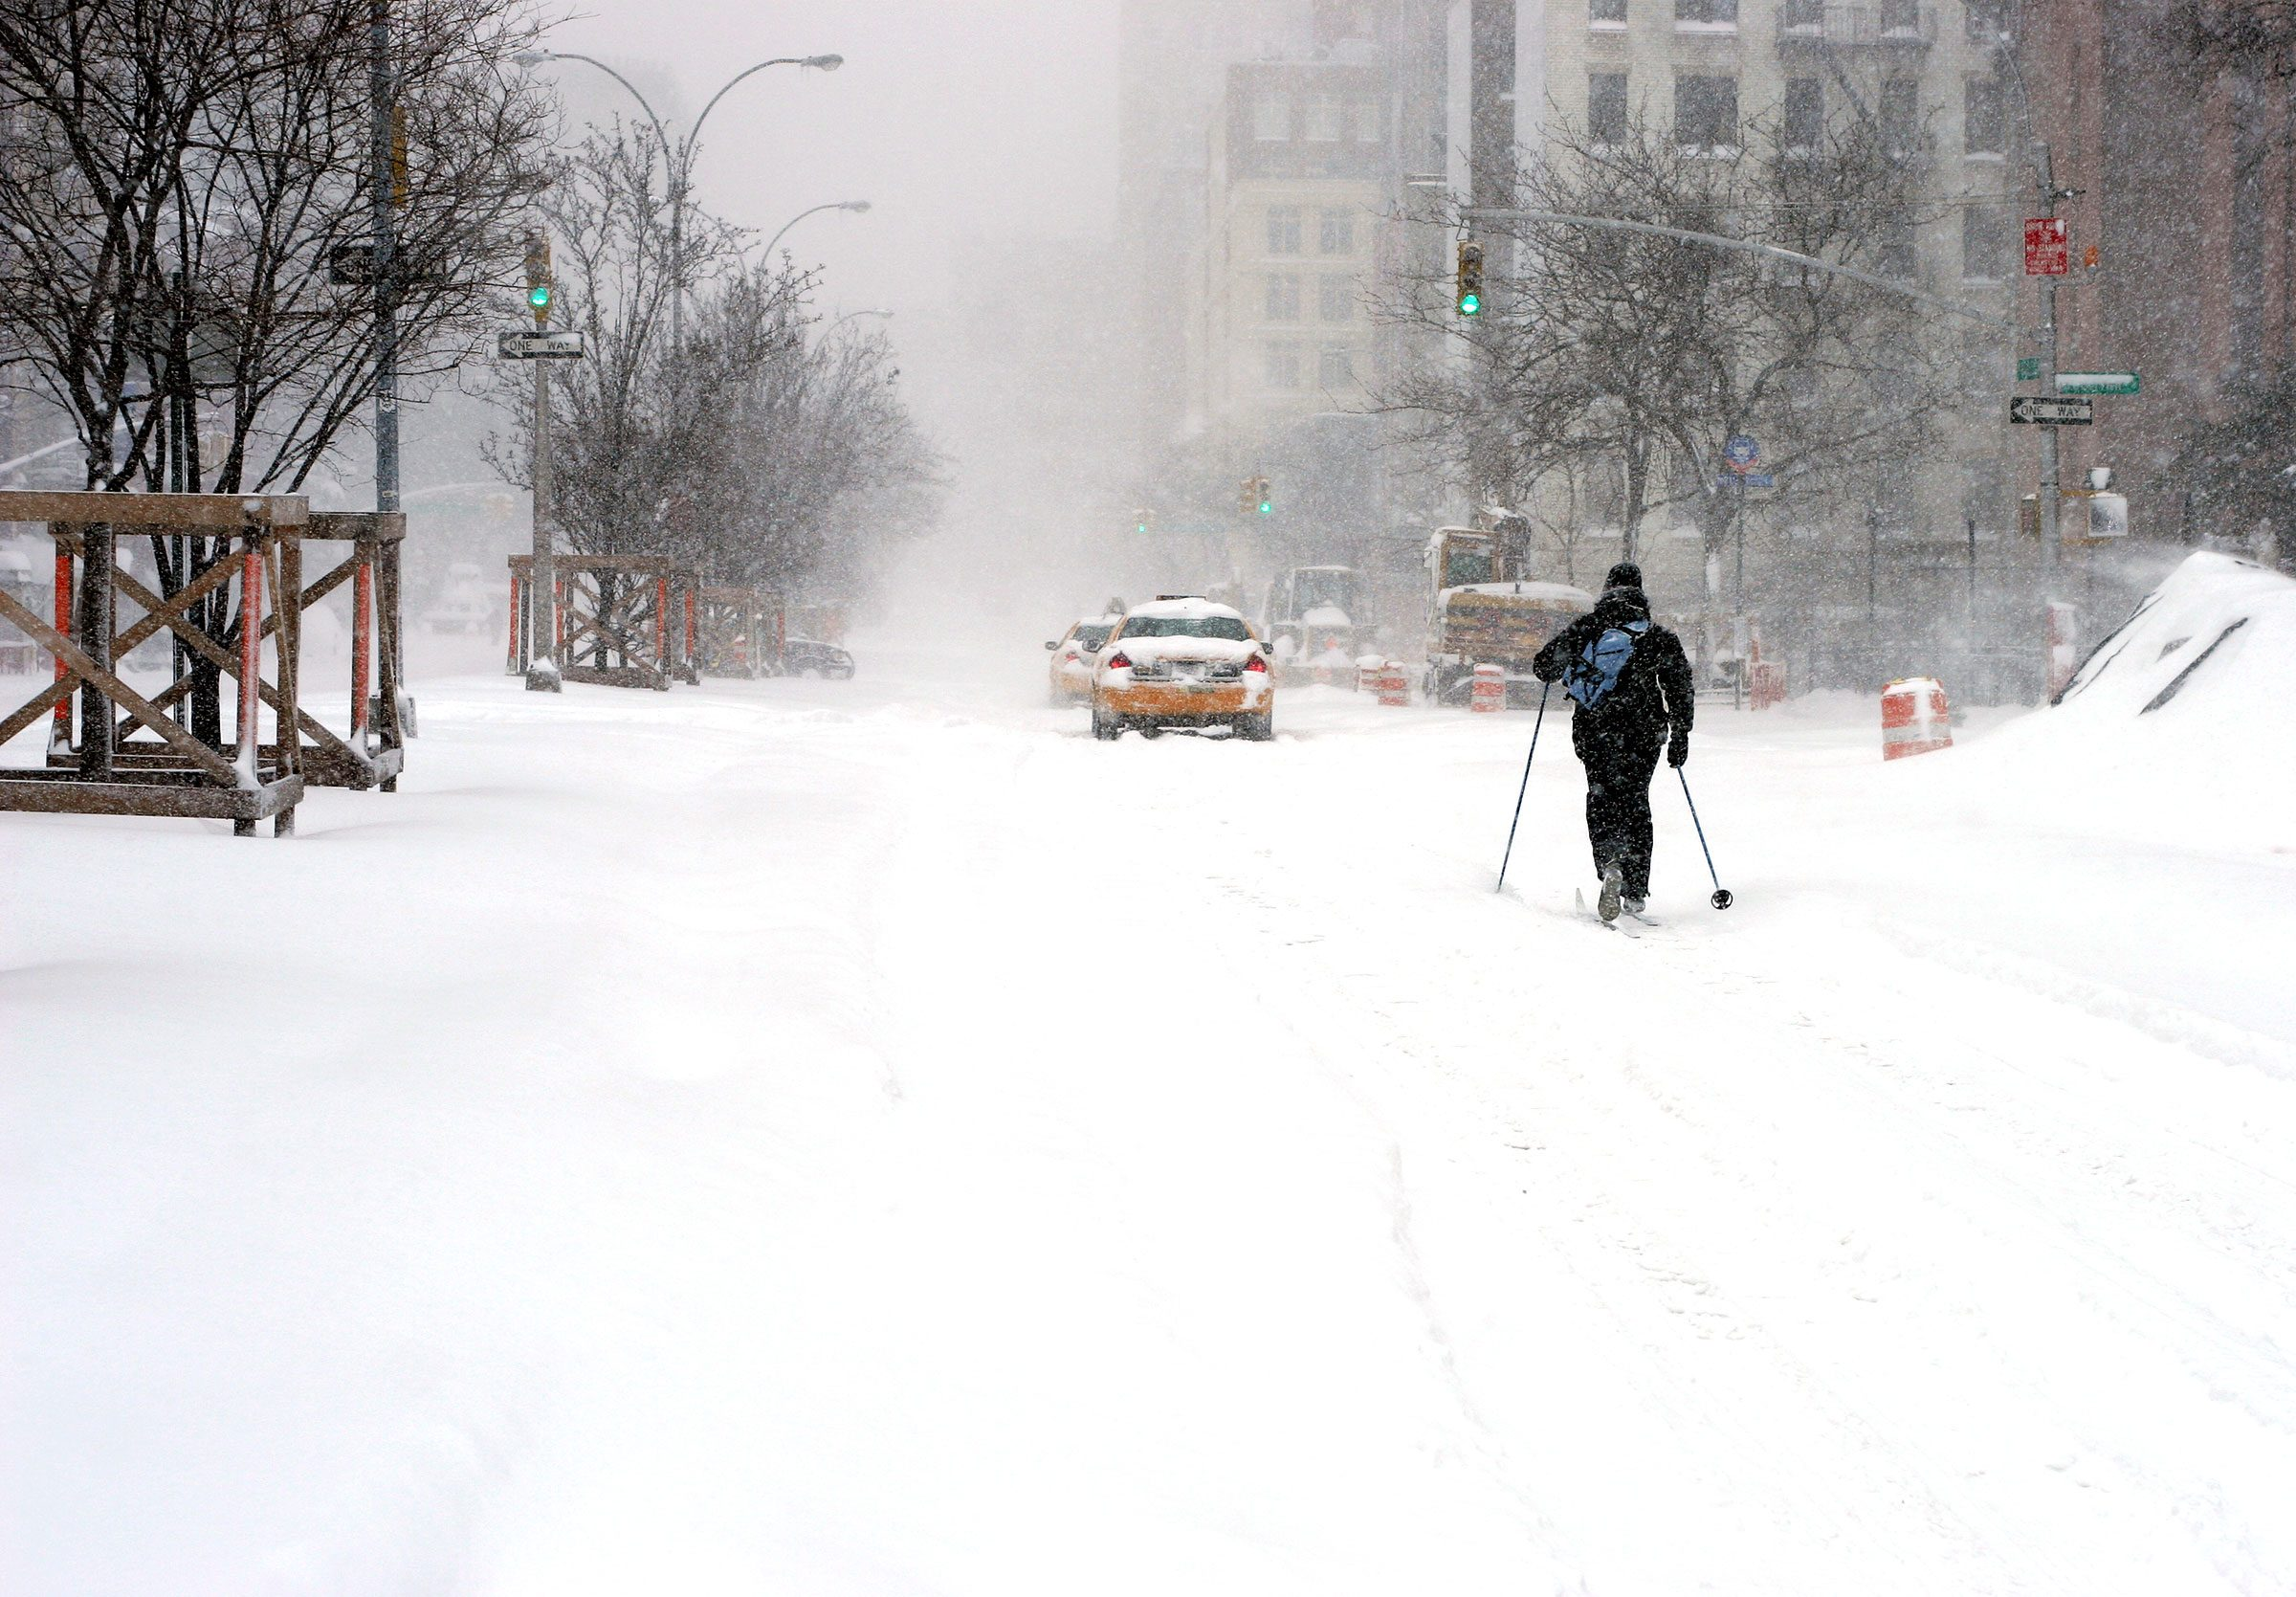 funny snow storm wallpaper - photo #10